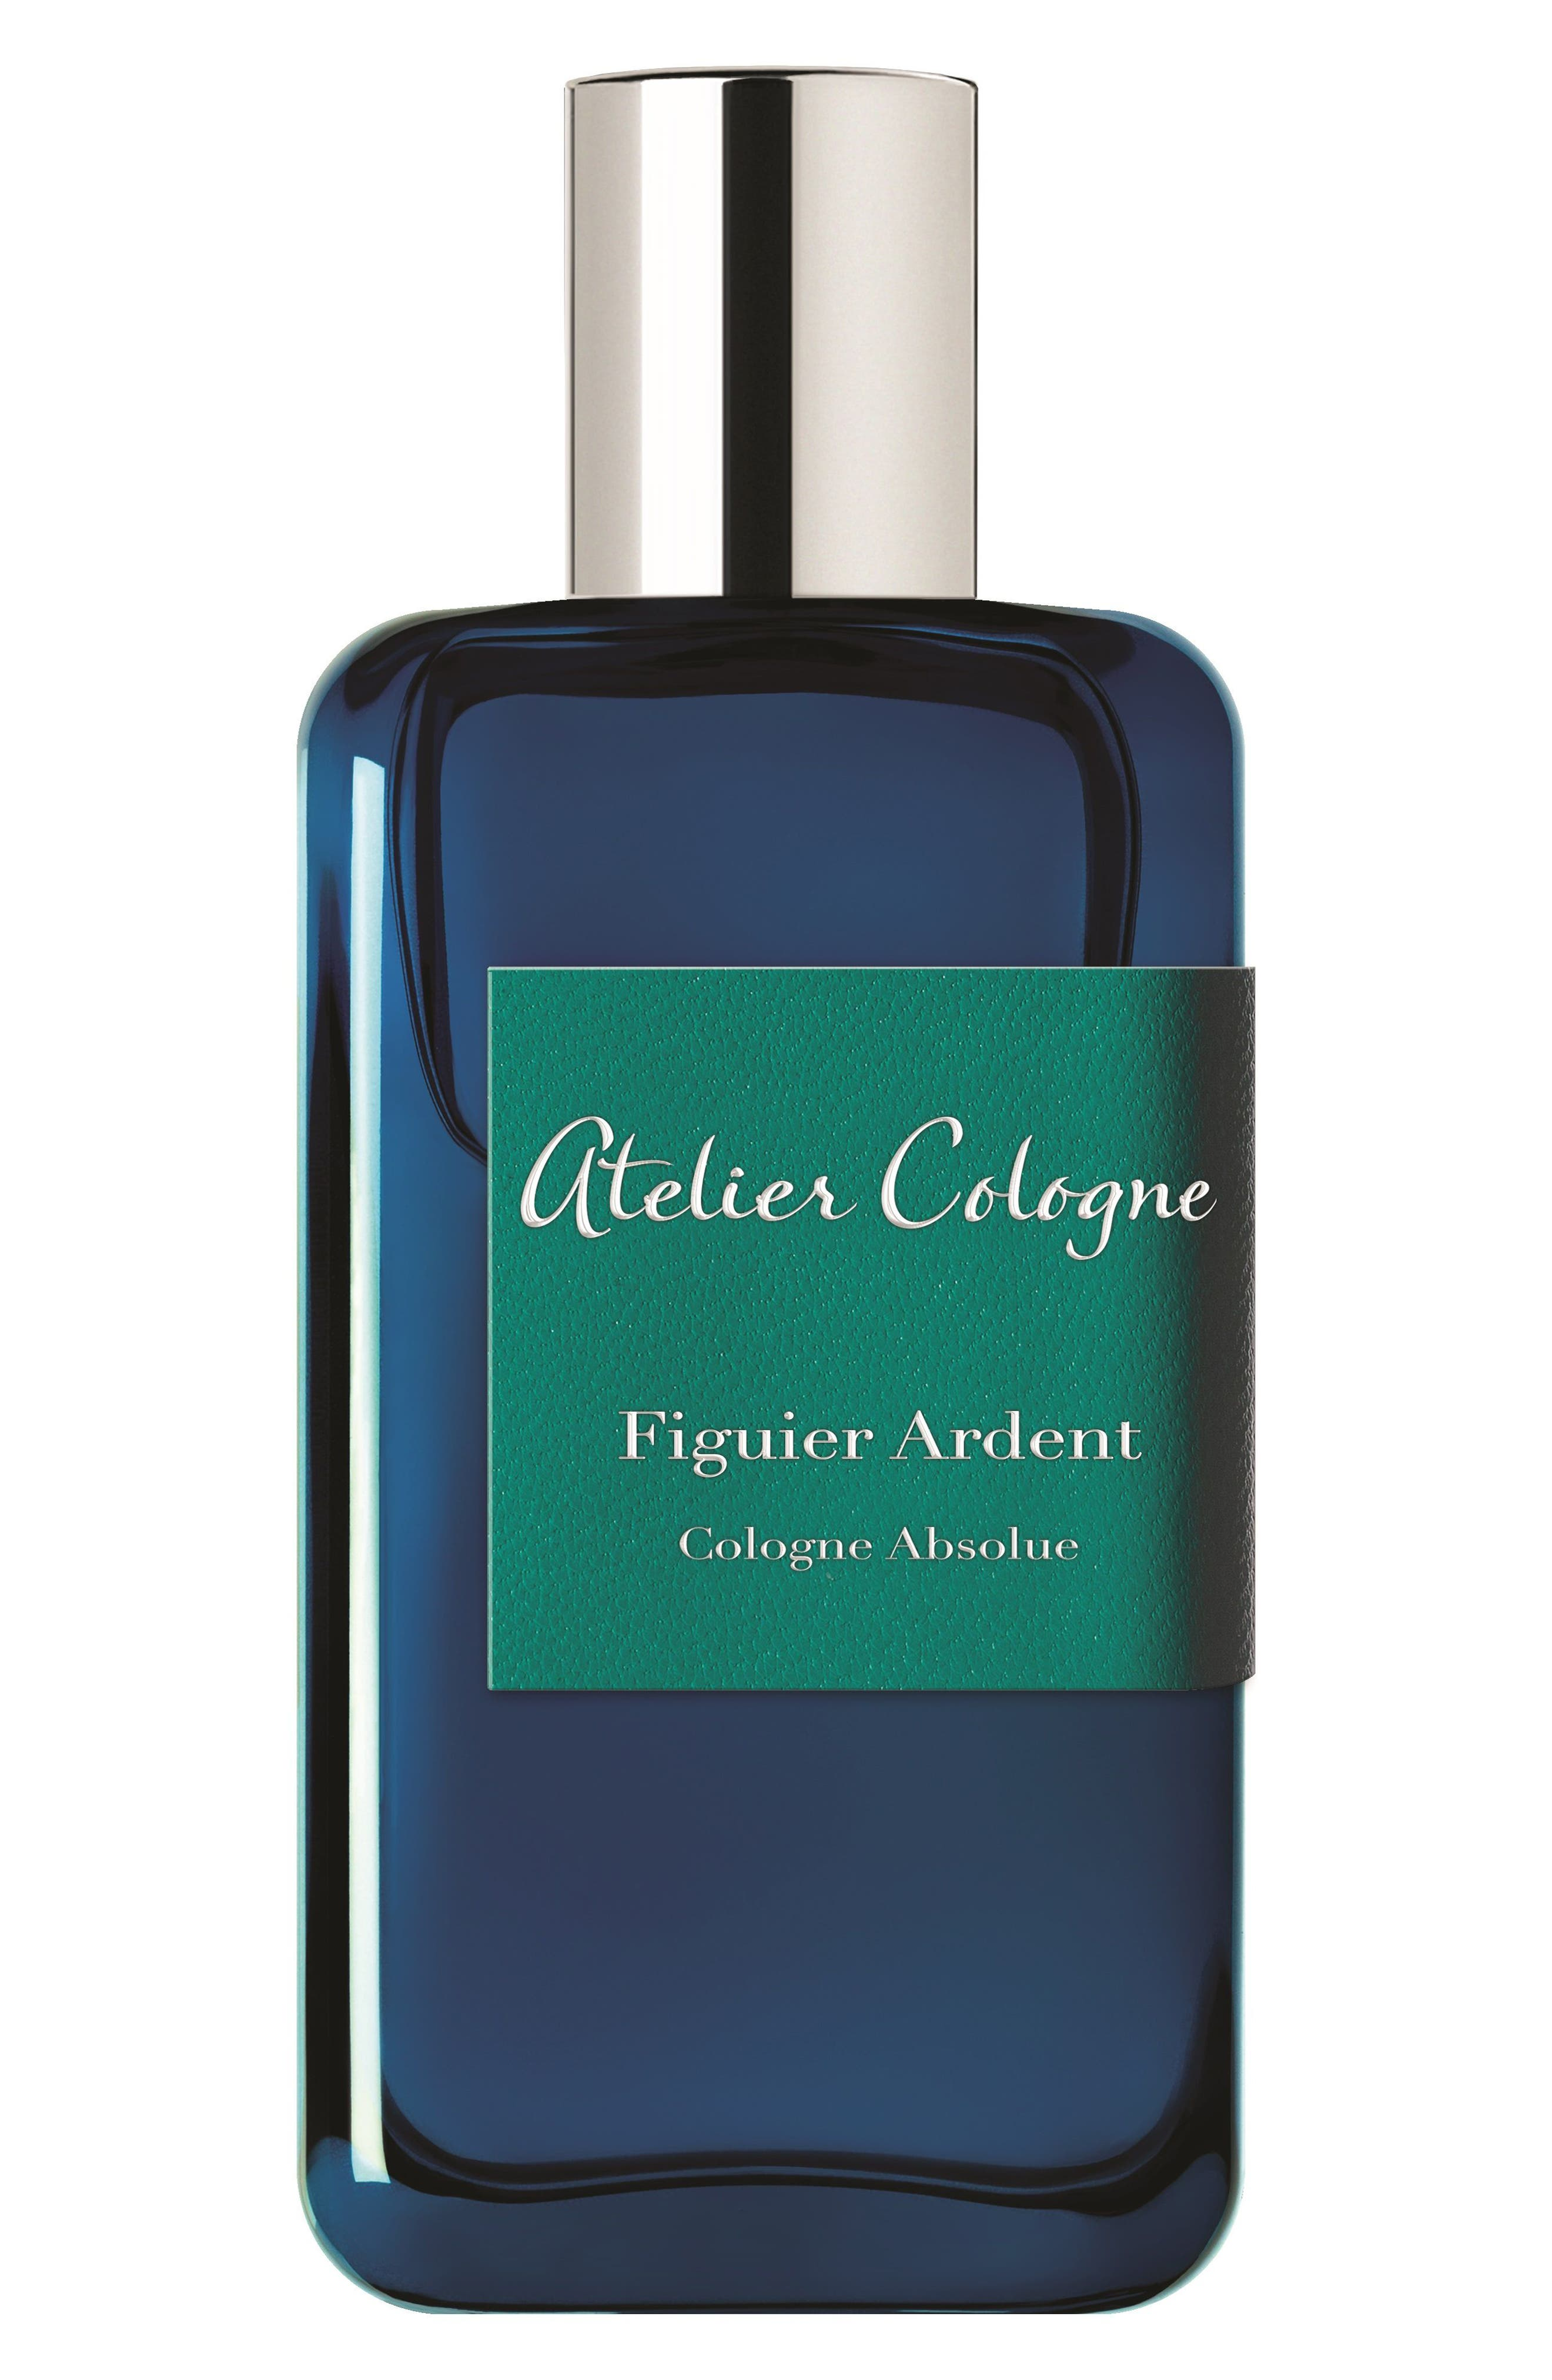 ATELIER COLOGNE,                             Figuier Ardent Cologne Absolue,                             Main thumbnail 1, color,                             NO COLOR